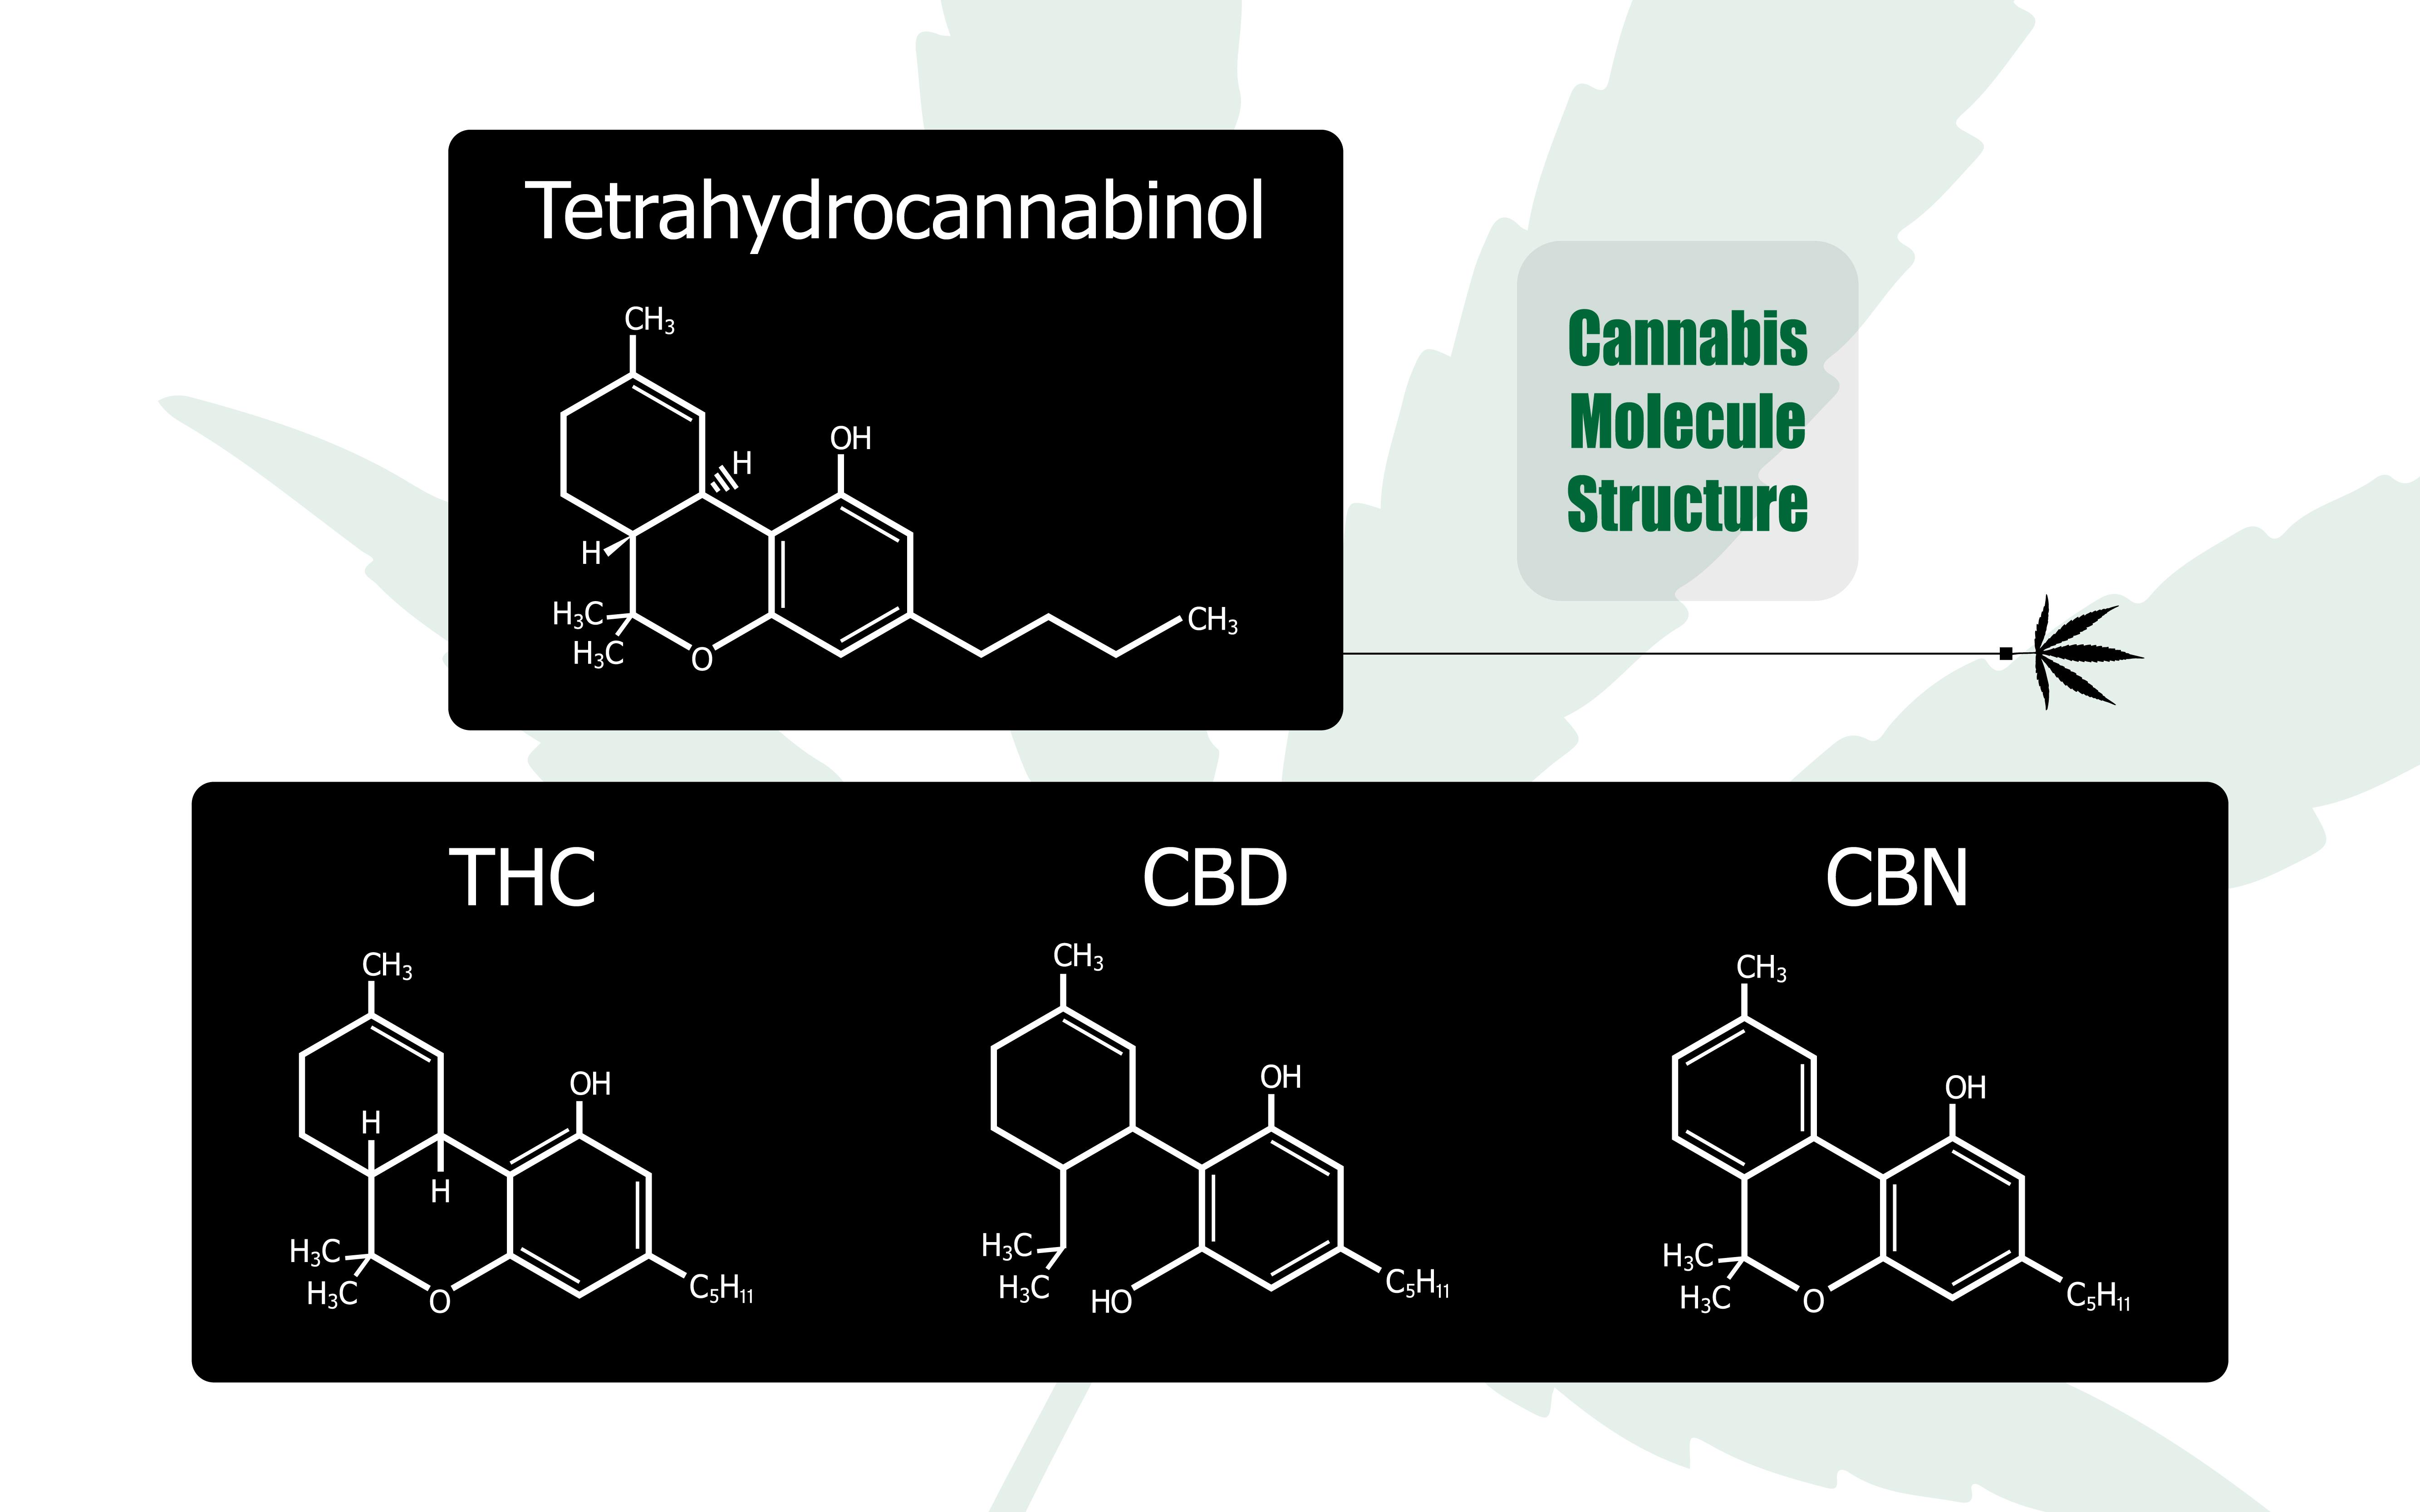 CBD THC effetto entourage contrasta simbiosi sistema immunitario psiche cannabis marijuana medica cannabinoide modulare degli endocannabinoidi